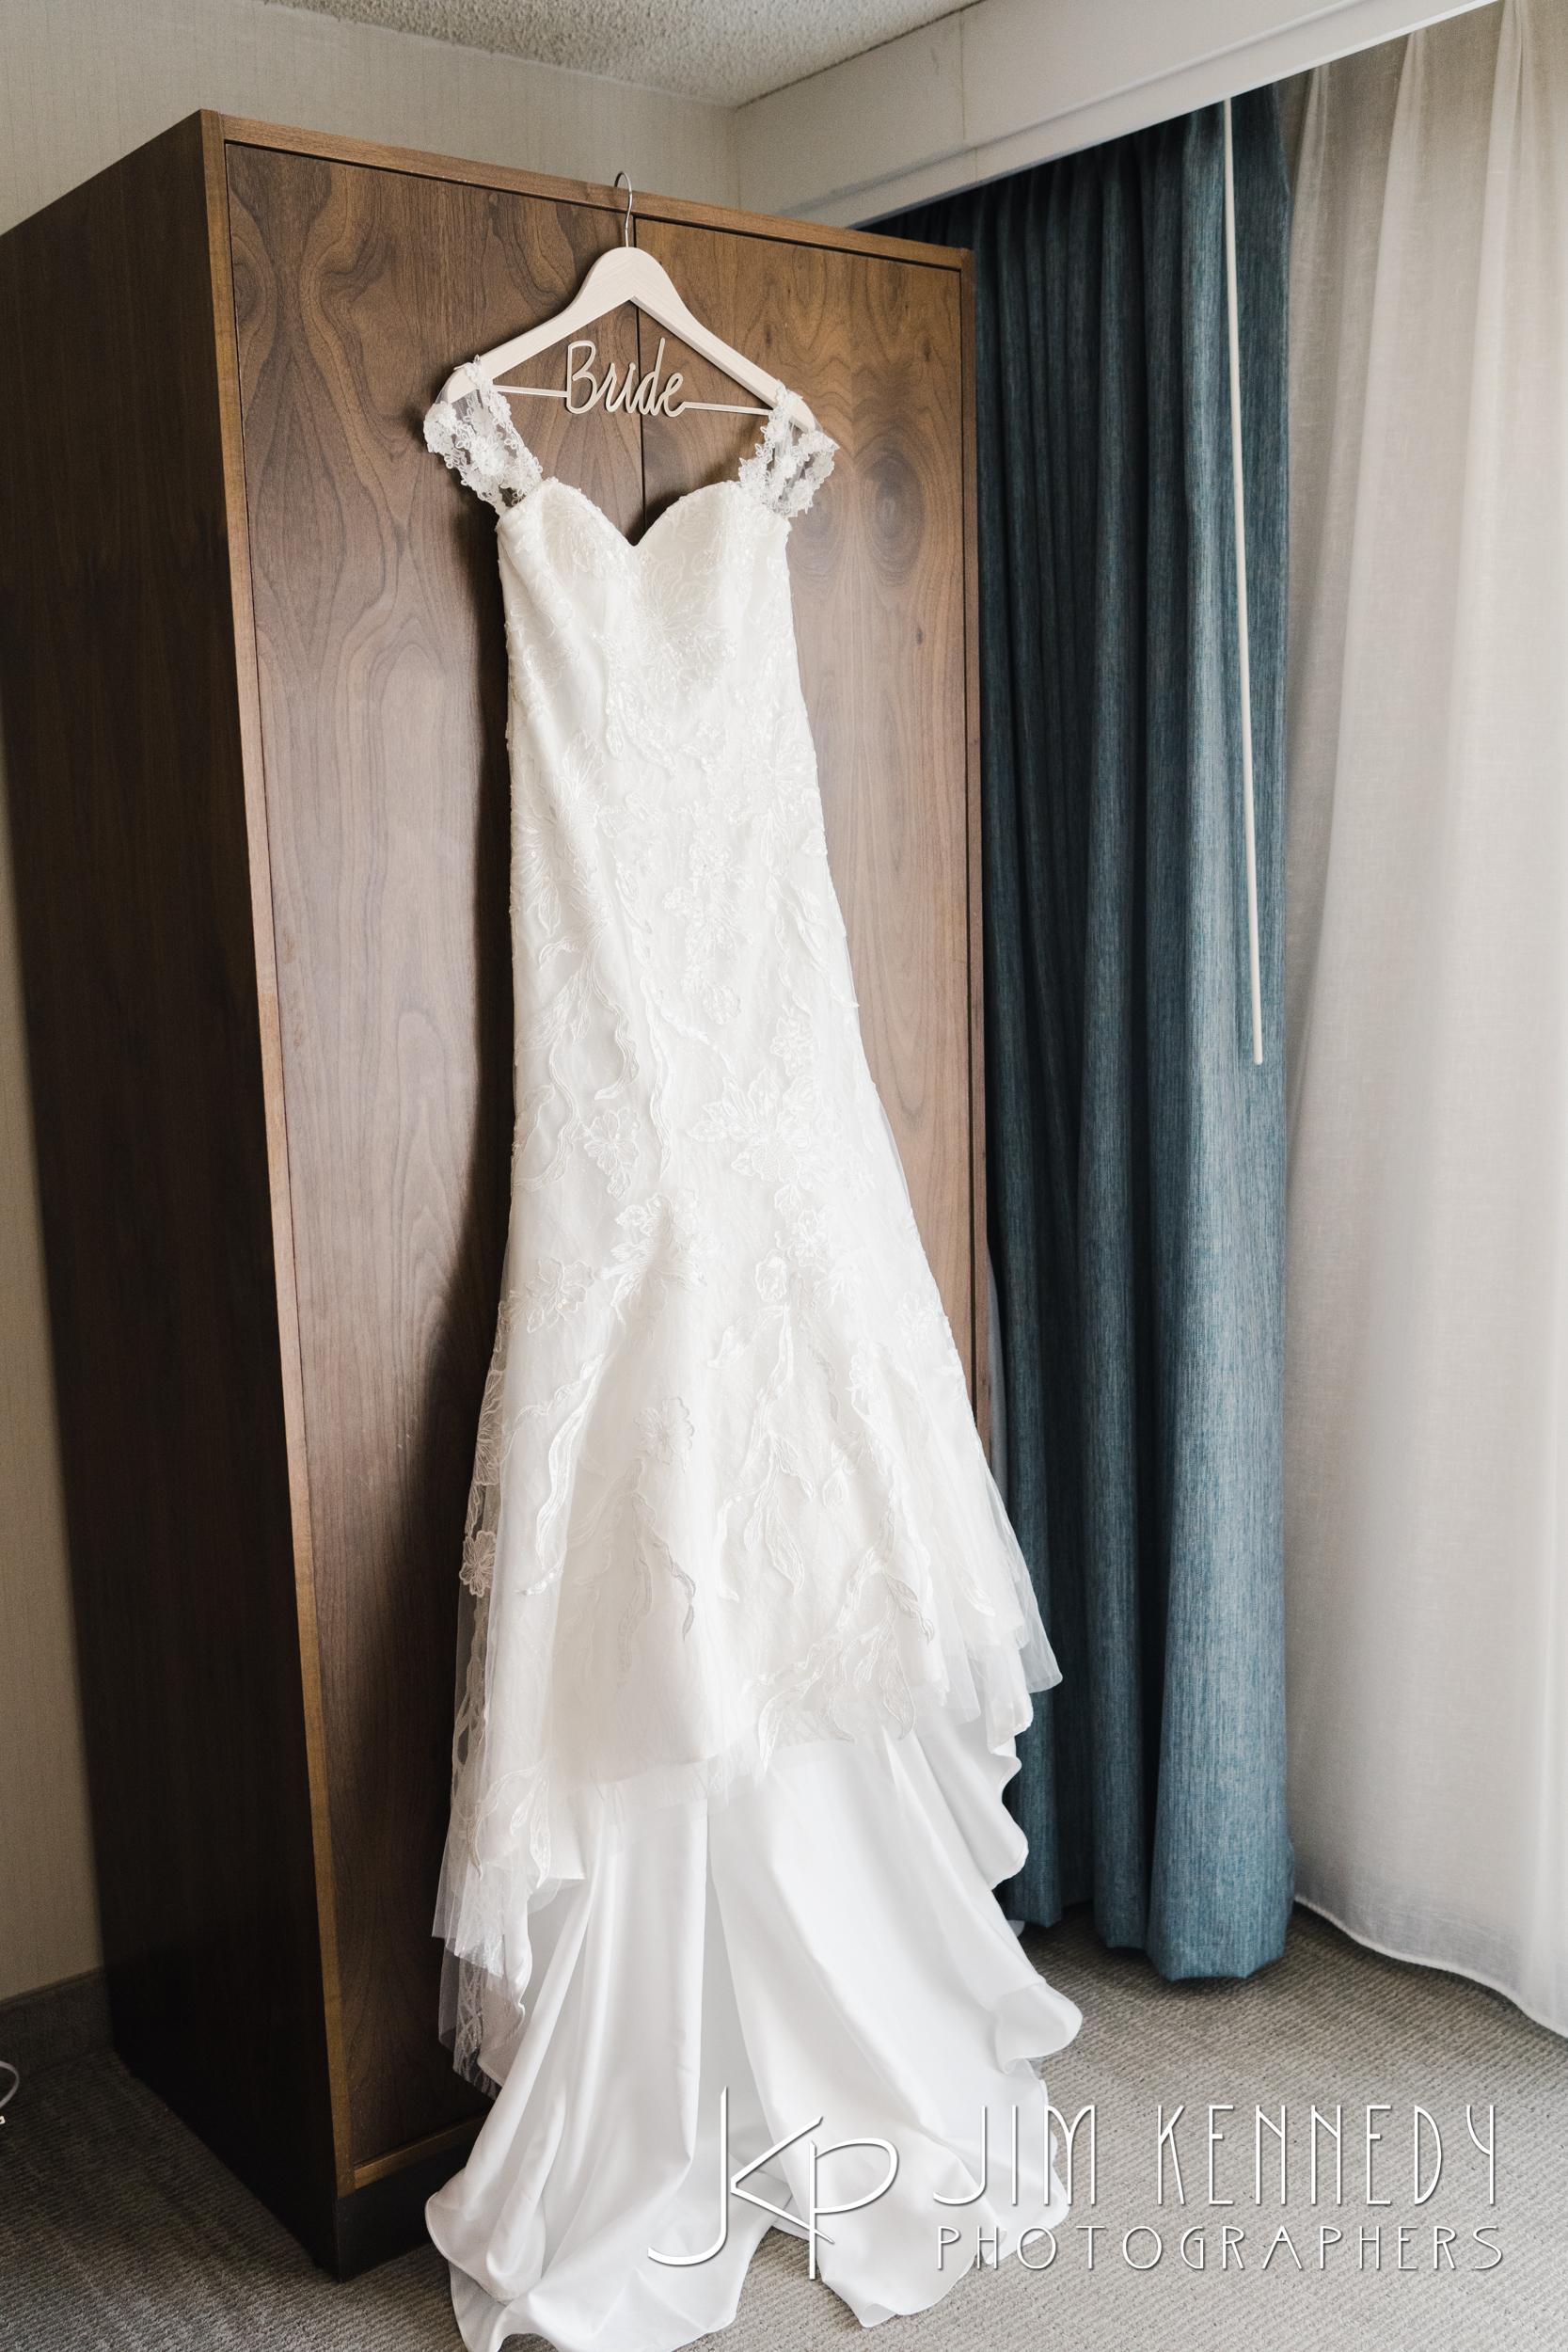 nixon-library-wedding-011.JPG